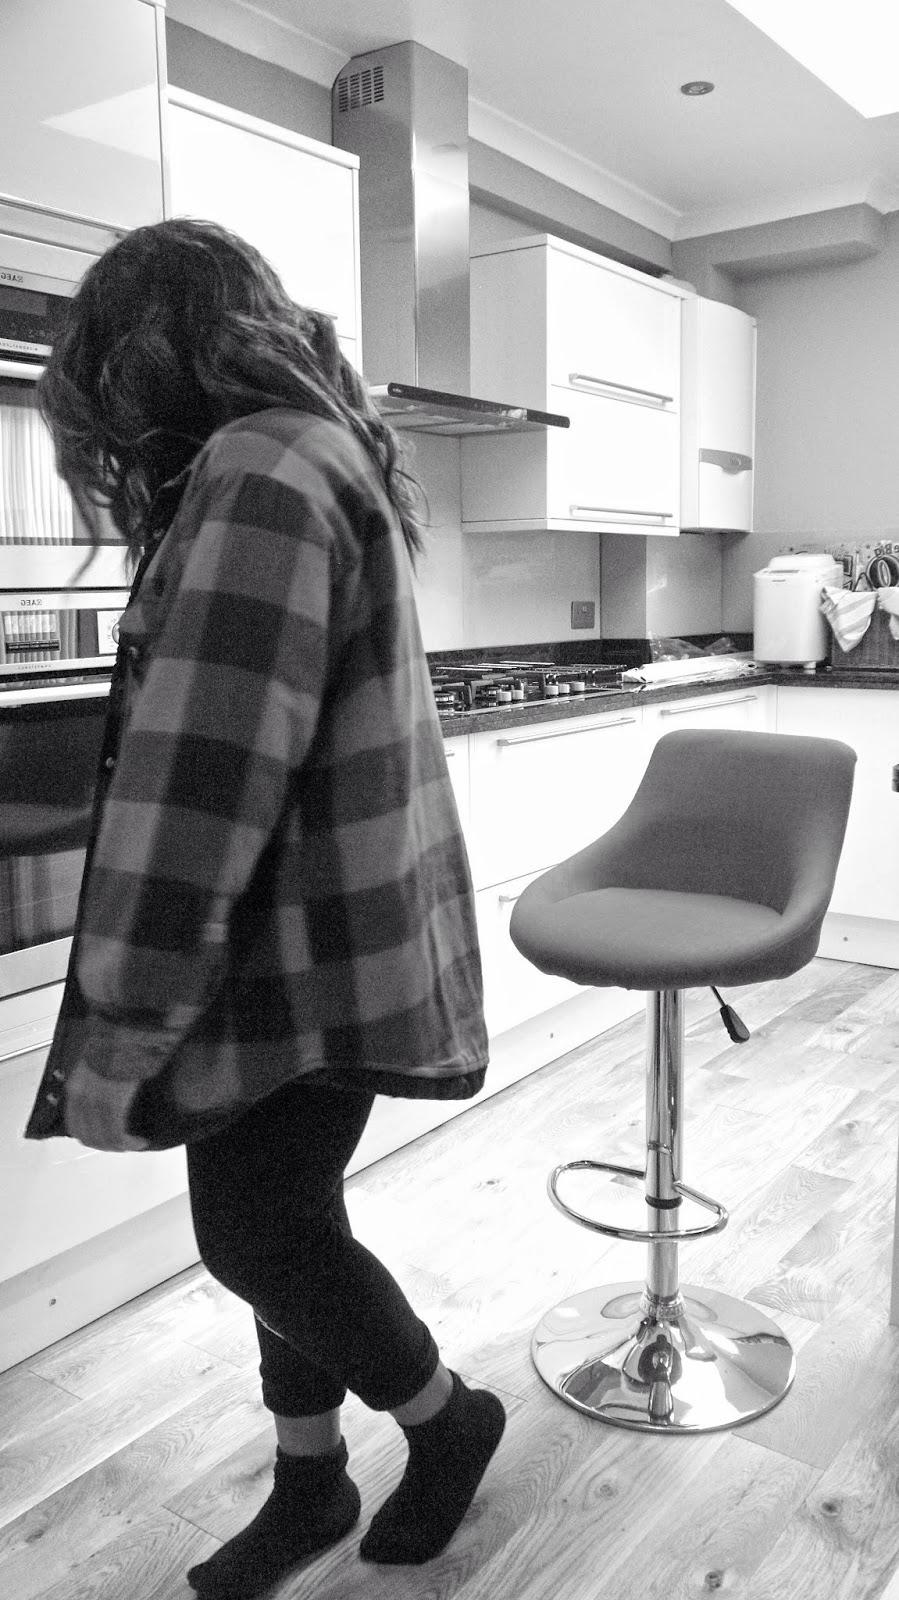 fashion blogger looney tunes forever 21 sylvester jogging bottoms black and white la mode d'emm